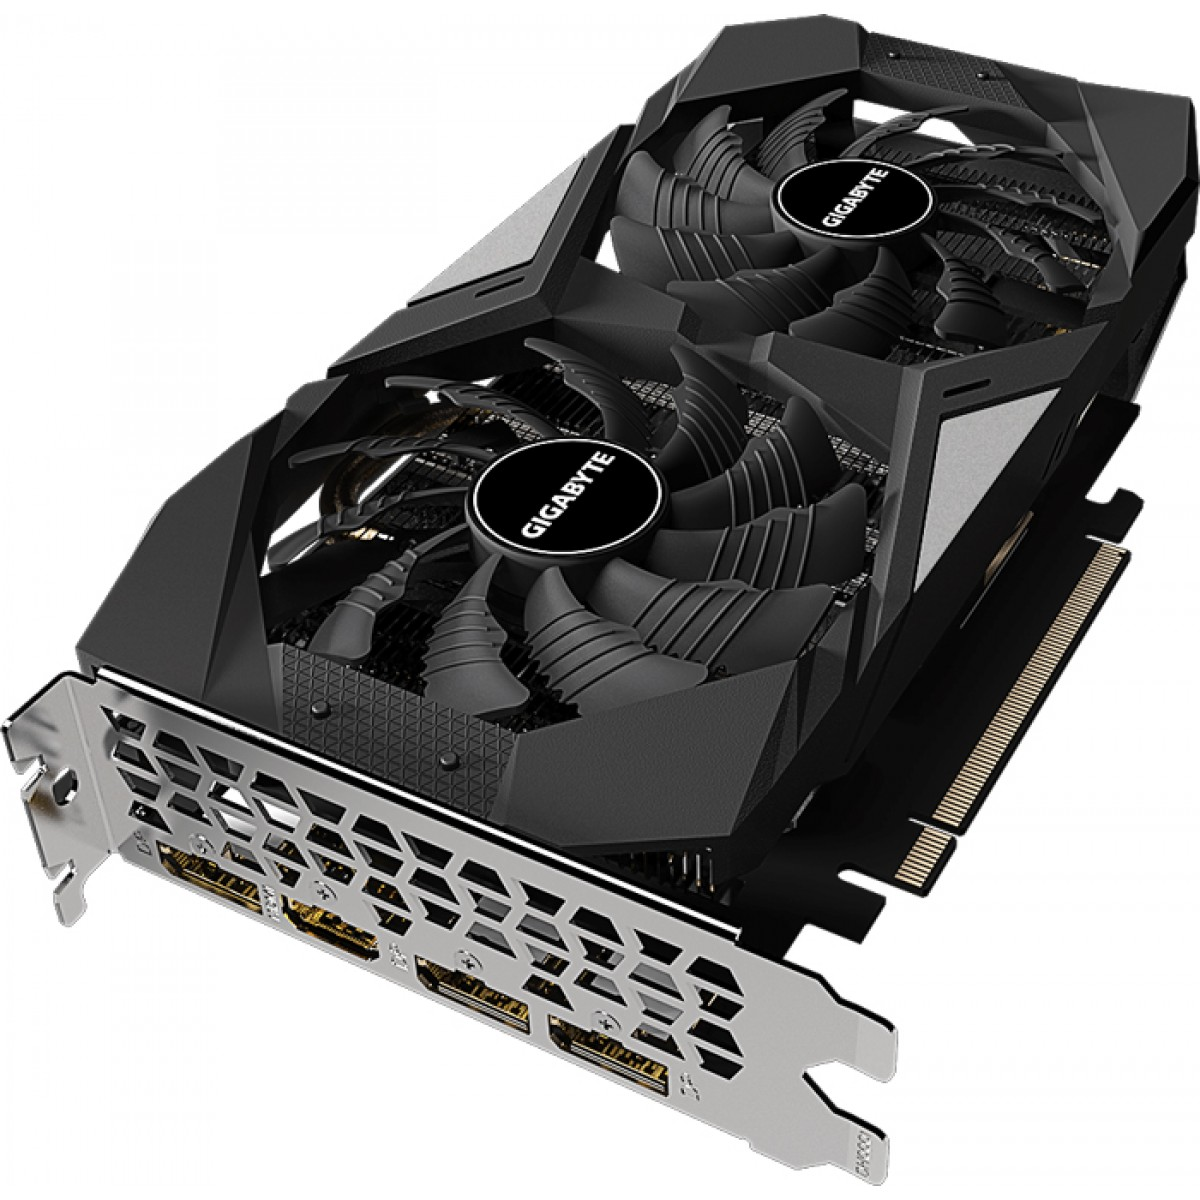 Placa de Video Gigabyte GeForce GTX 1660 Super OC 6G Dual, 6GB GDDR6, 192Bit, GV-N166SOC-6GD